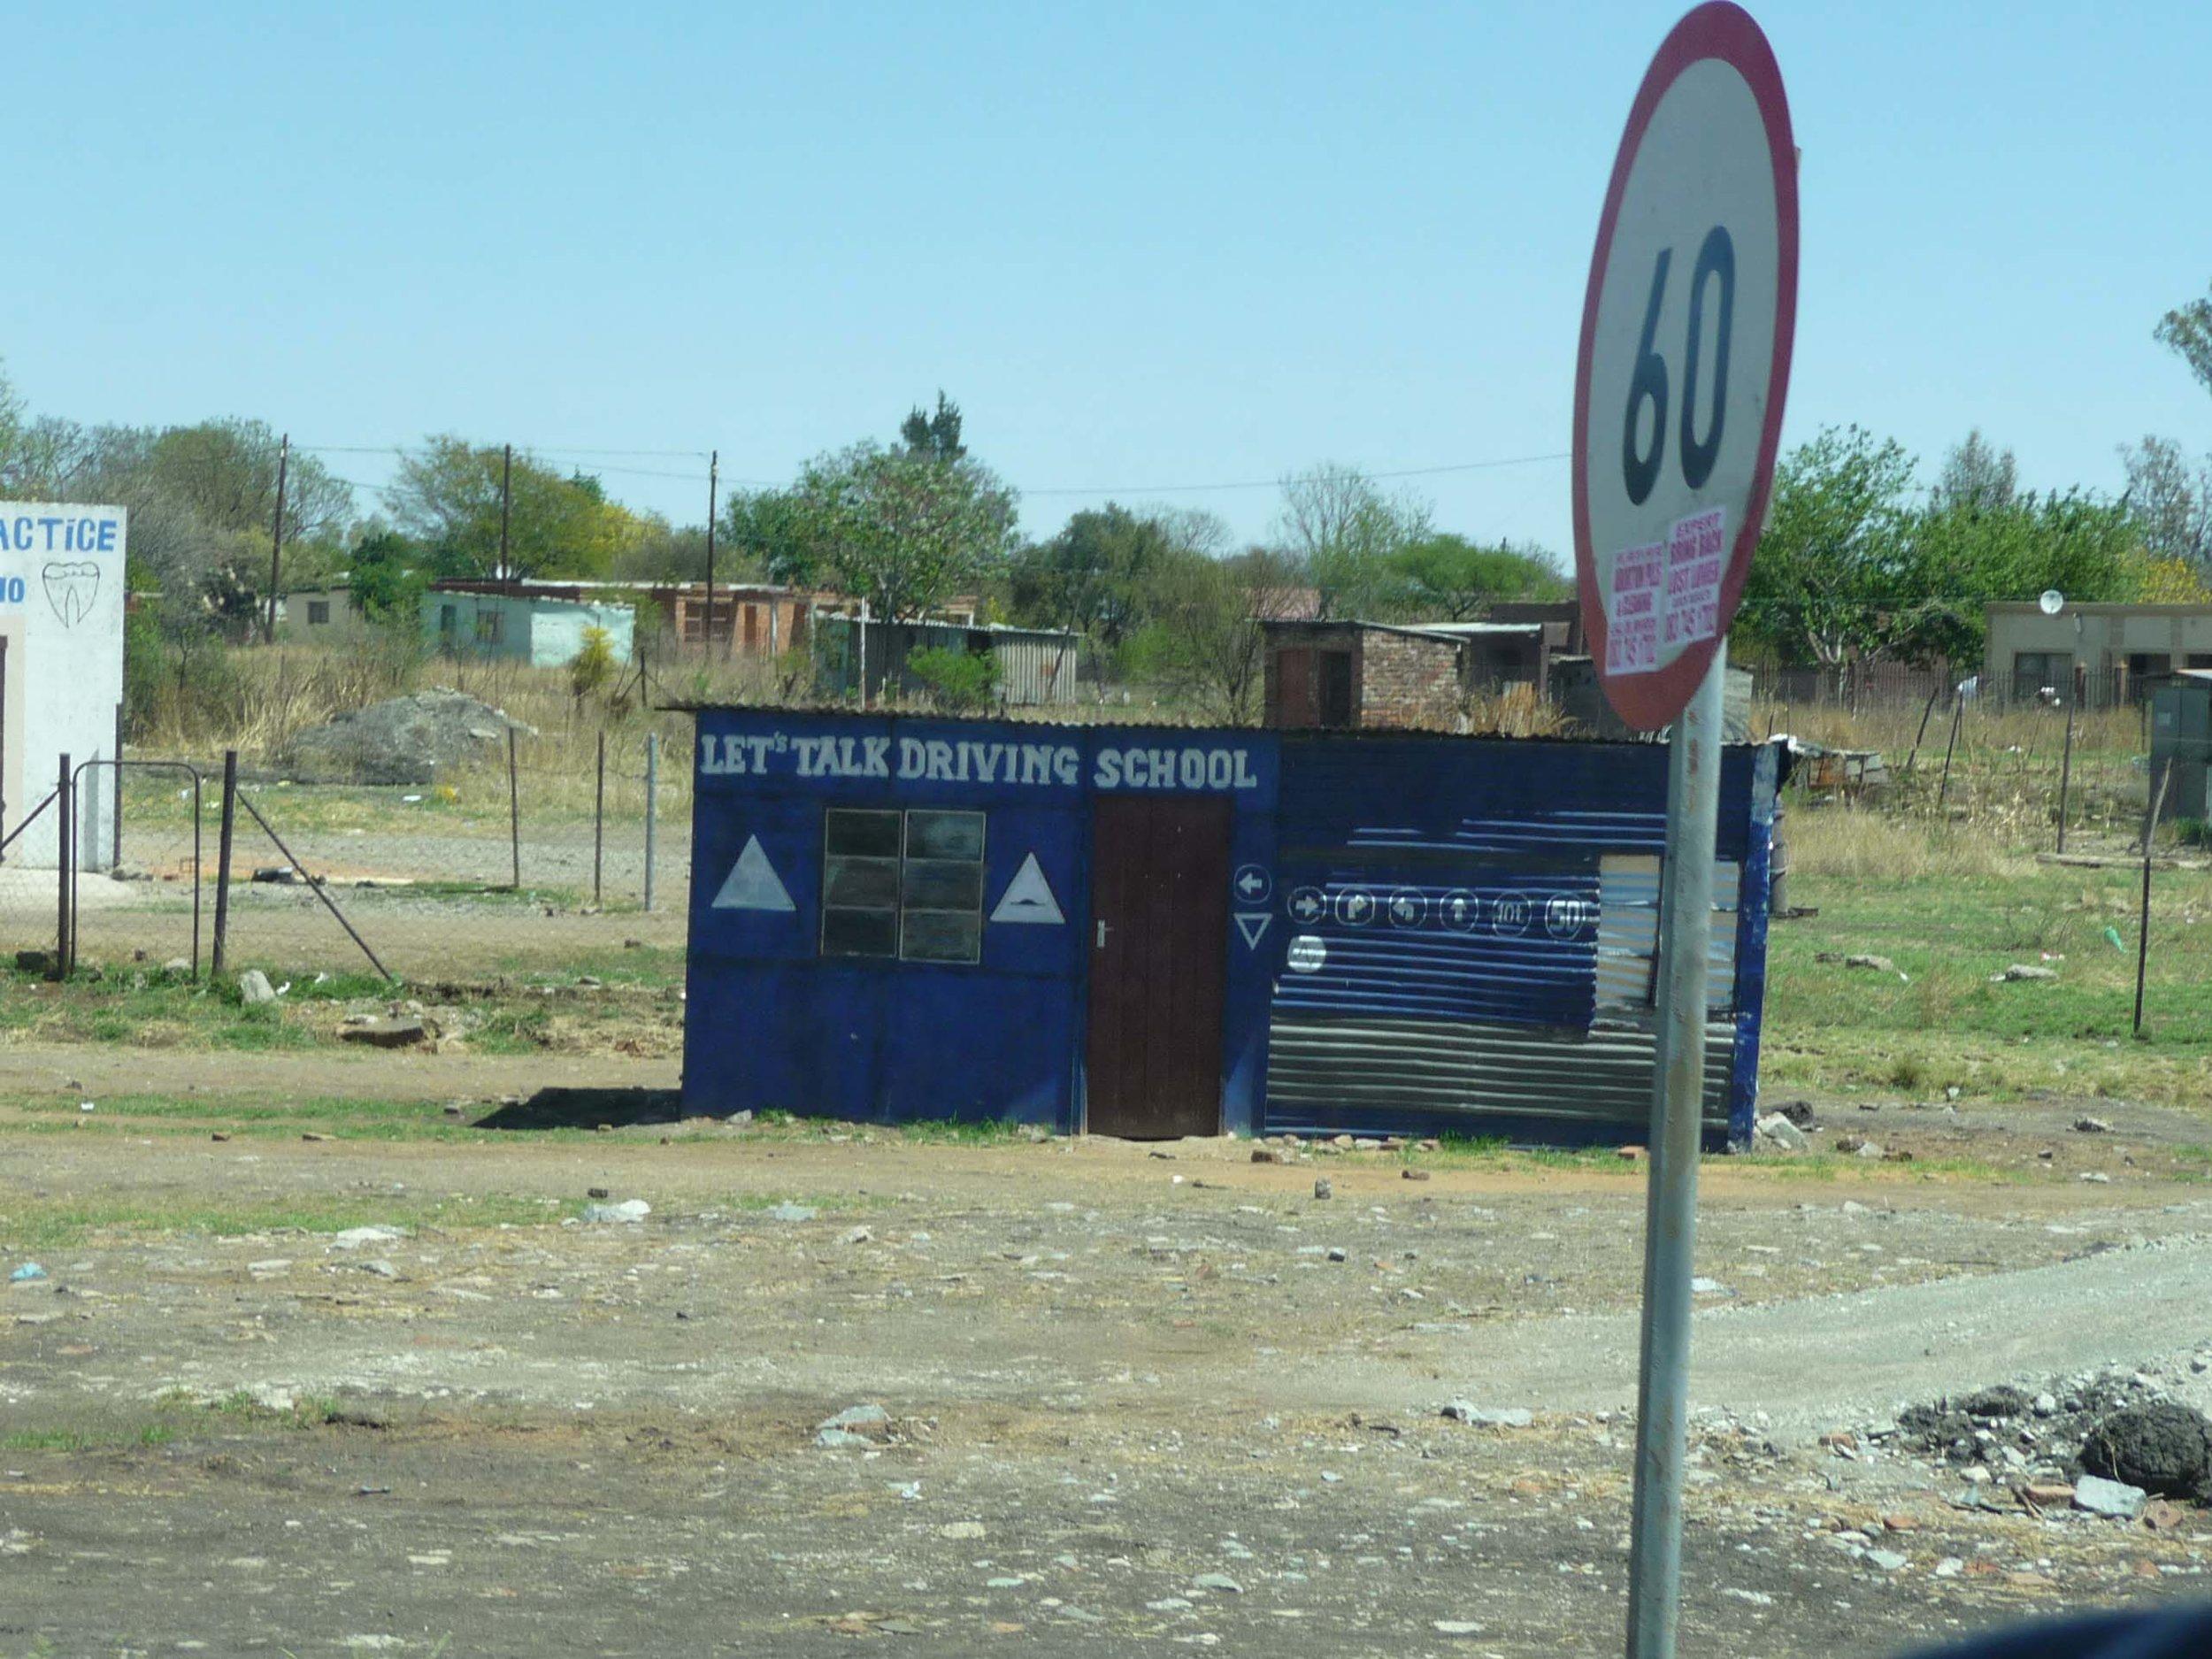 Driving school on the way to Pilanesberg